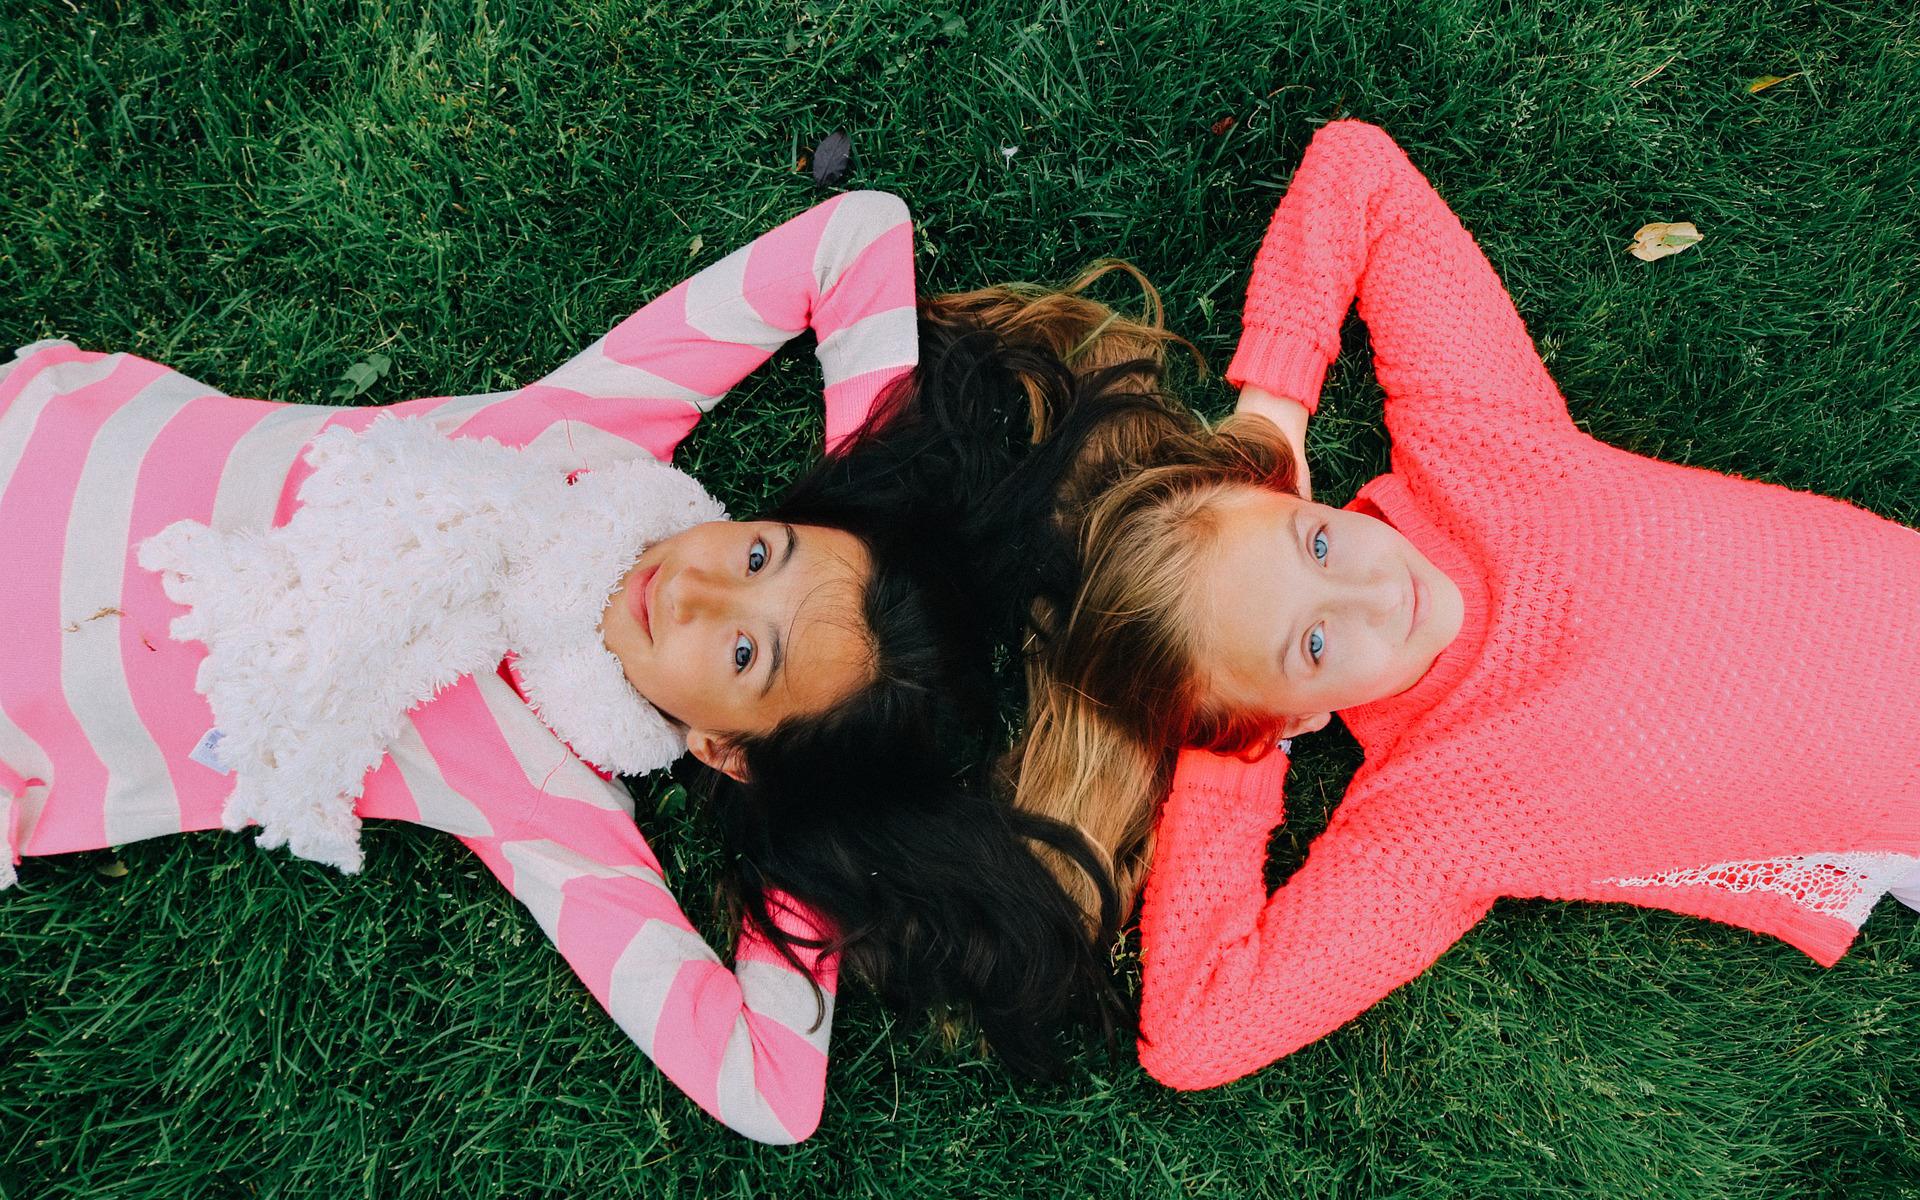 Child and Adolescent Mental Health MSc